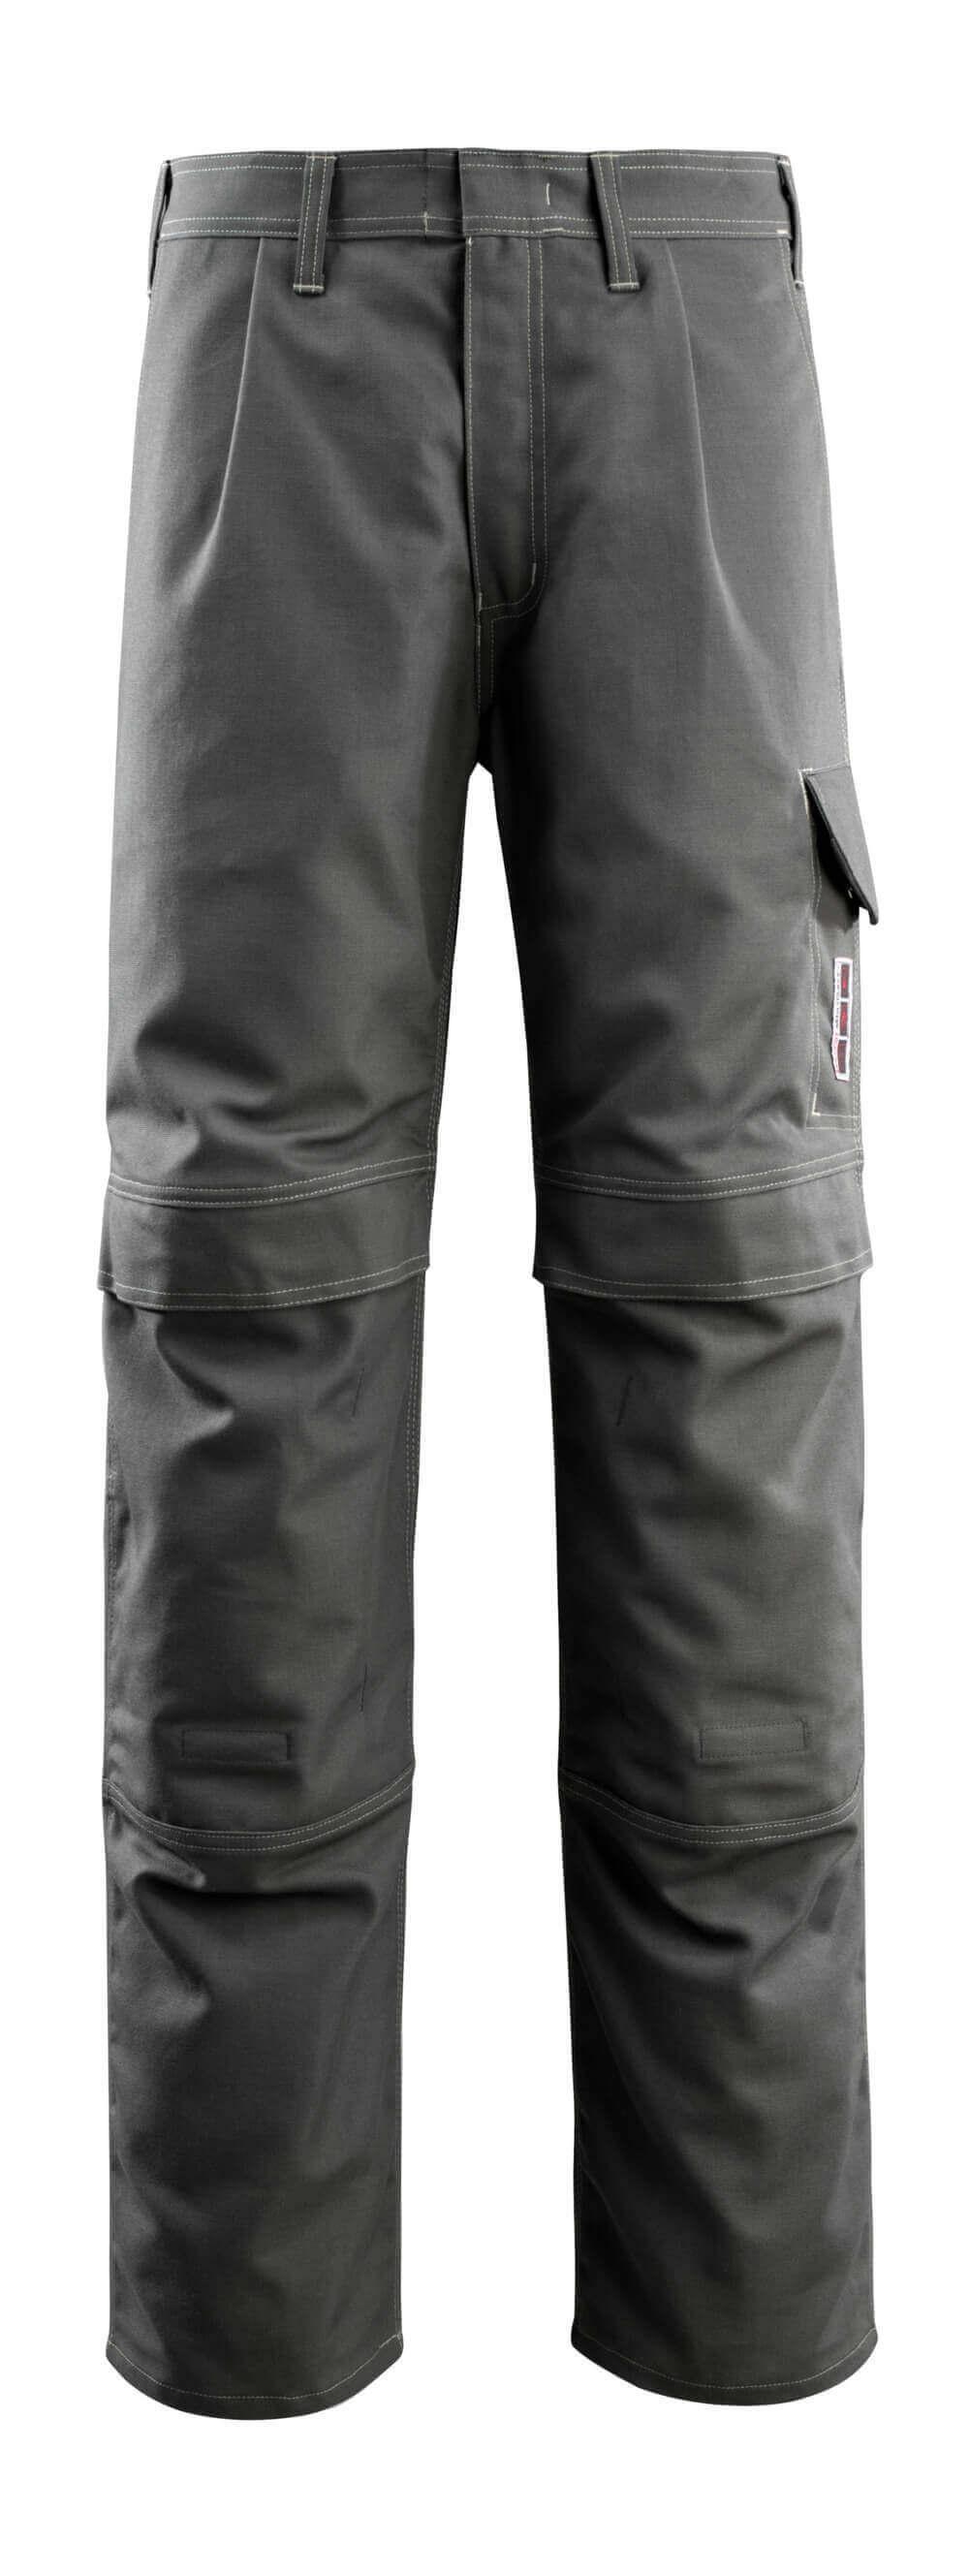 06679-135-18 Bukser med knælommer - mørk antracit